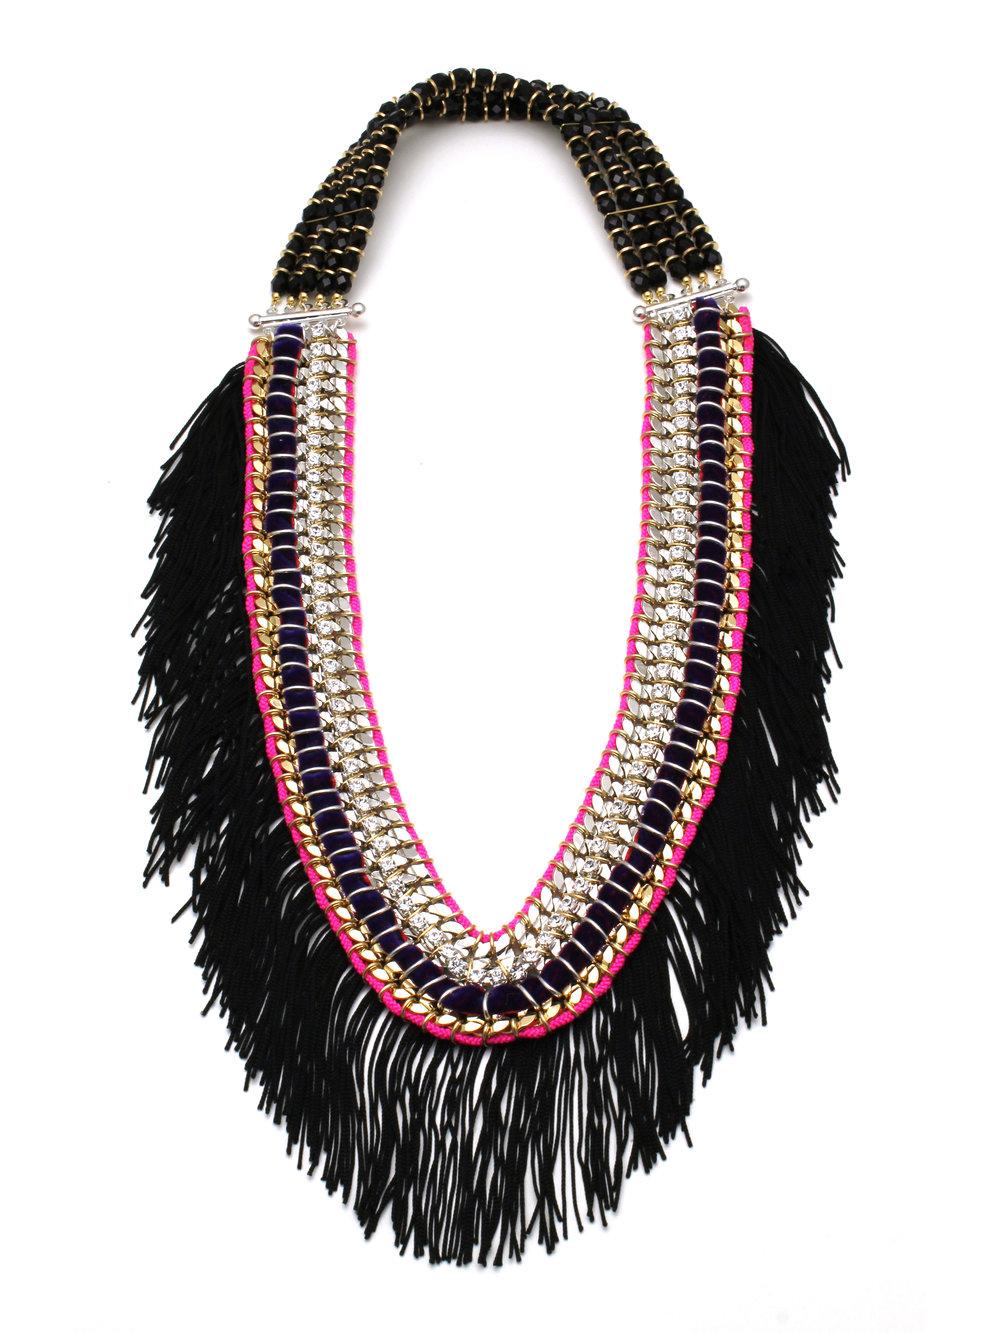 046 - Black Fringe Ribbon Necklace.jpg